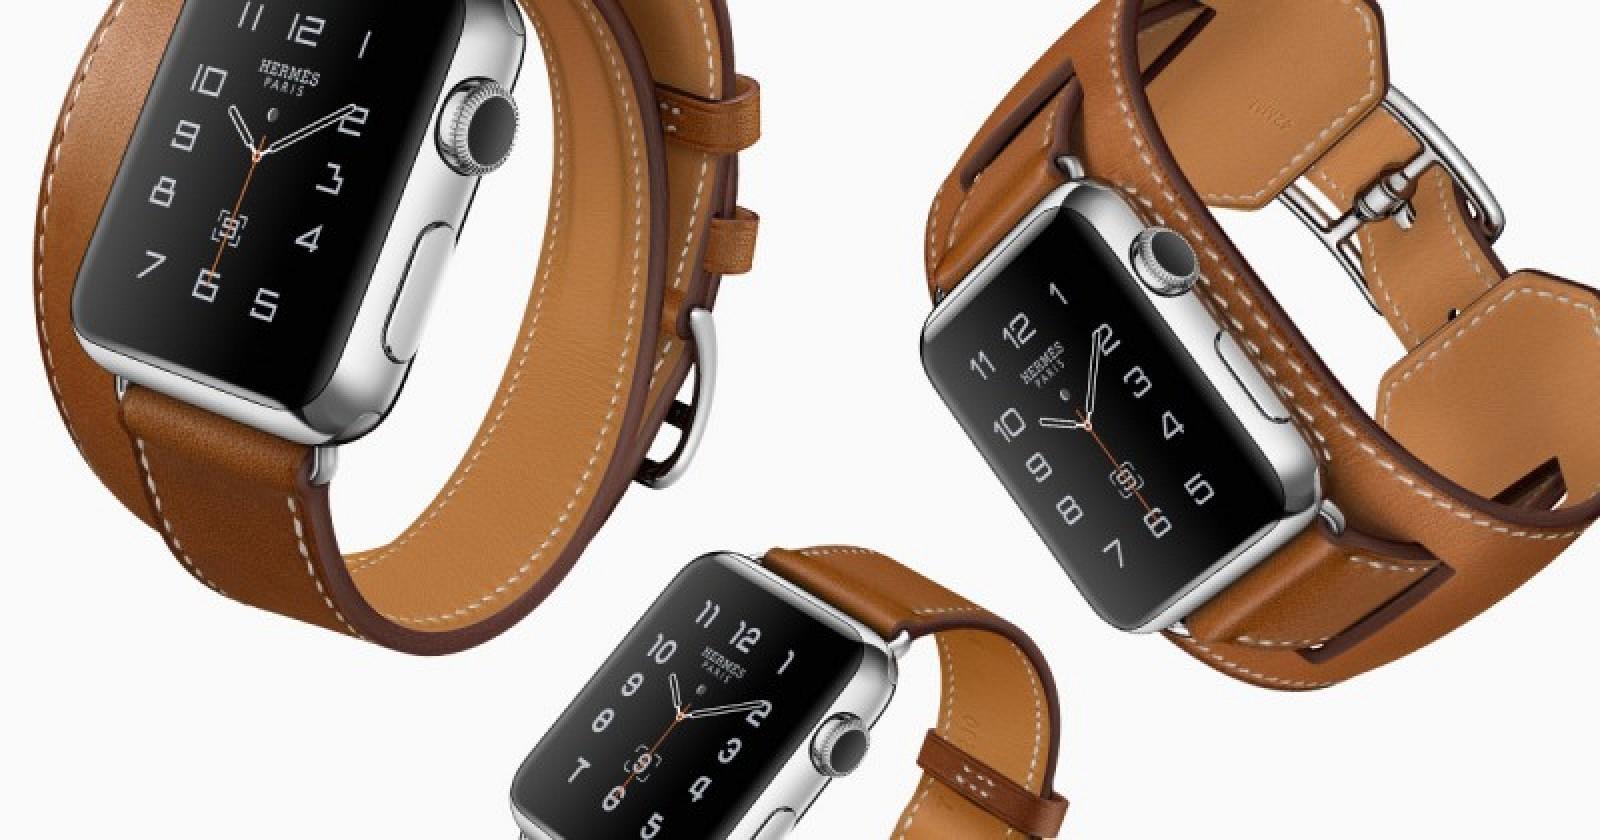 Apple x Hermes watch collab